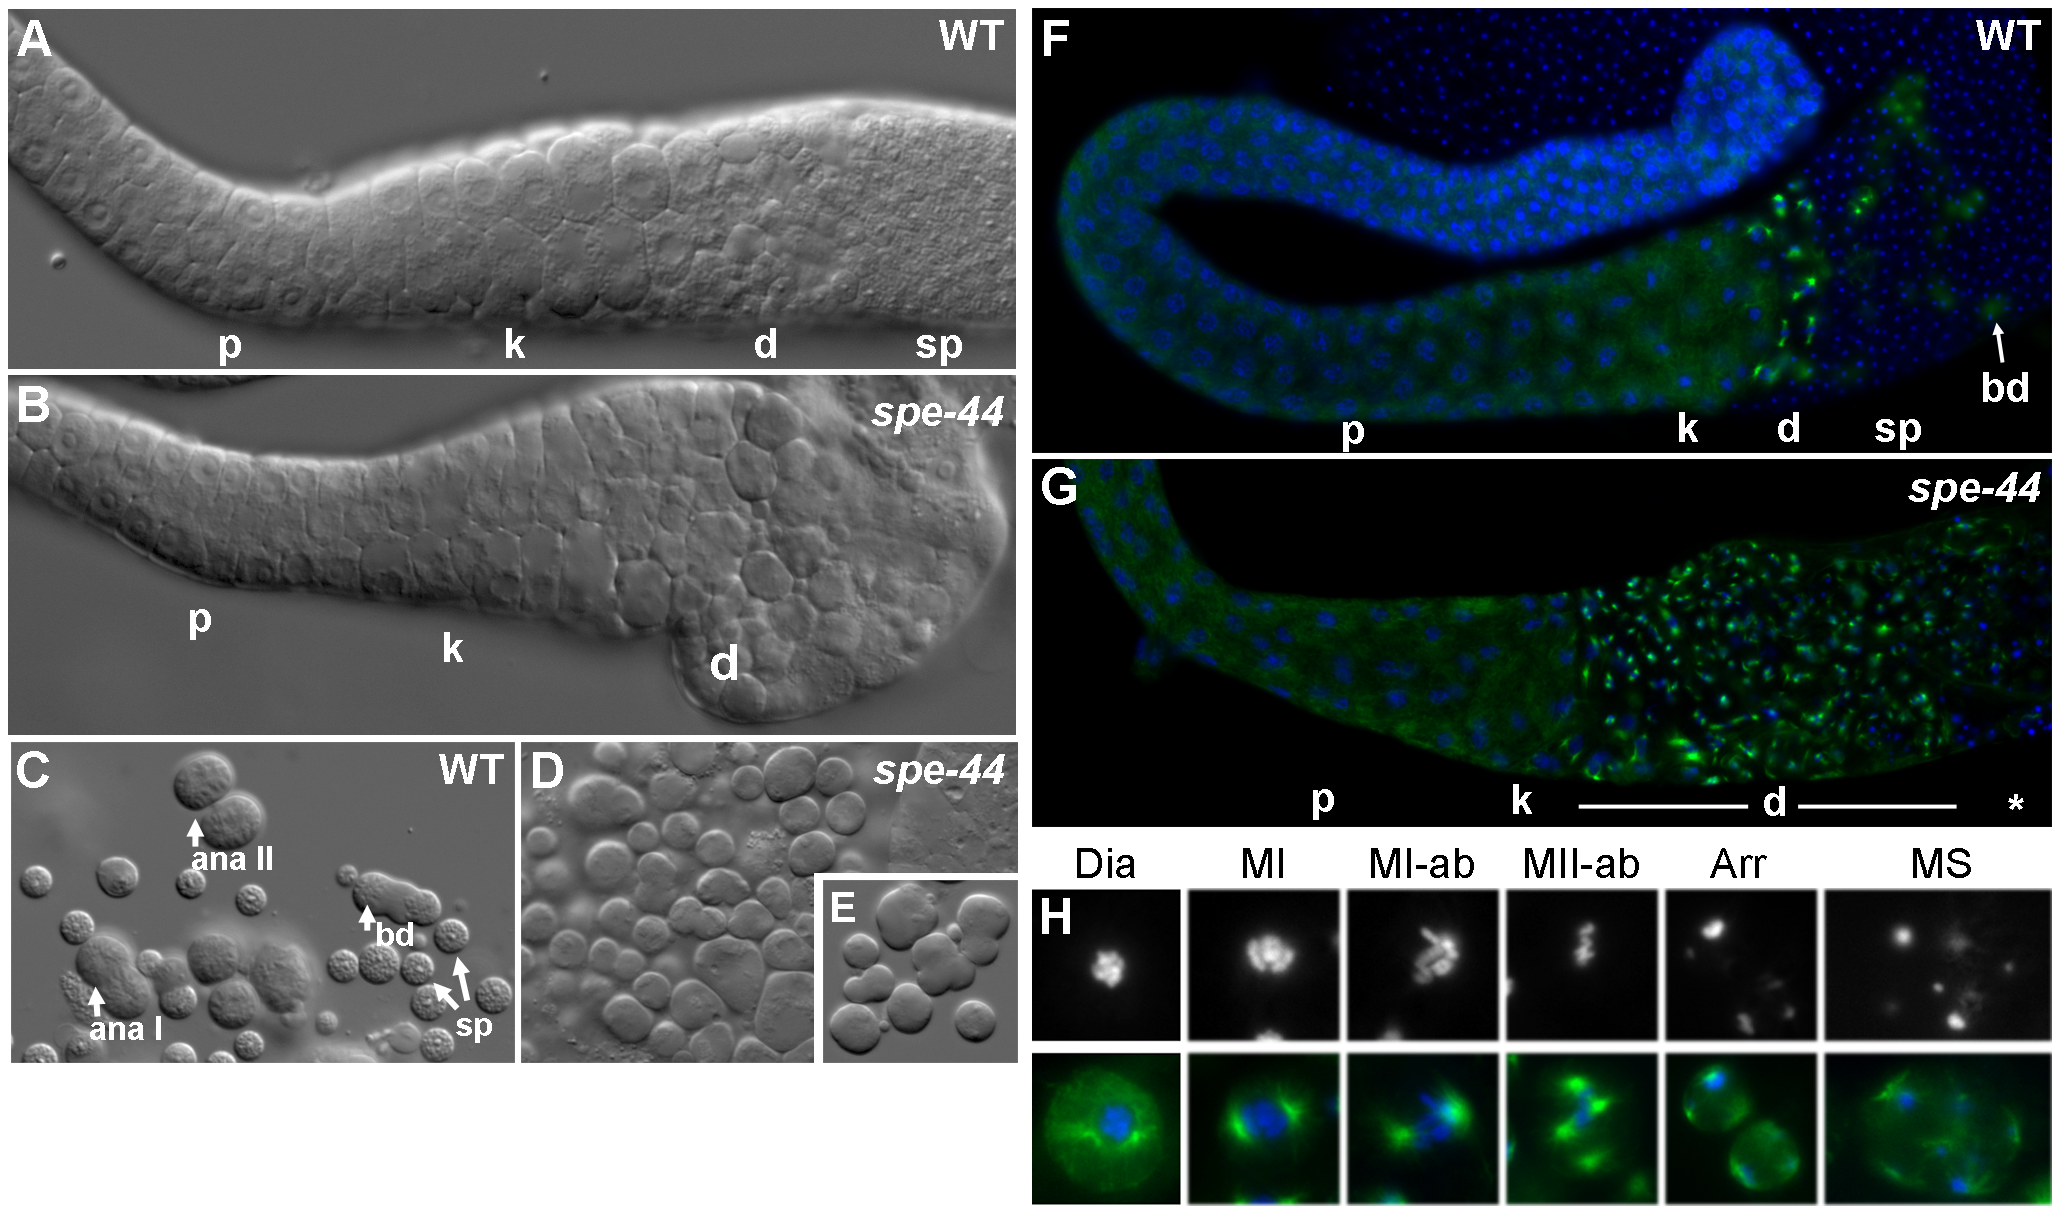 Spermatogenesis defects in <i>spe-44</i> males.